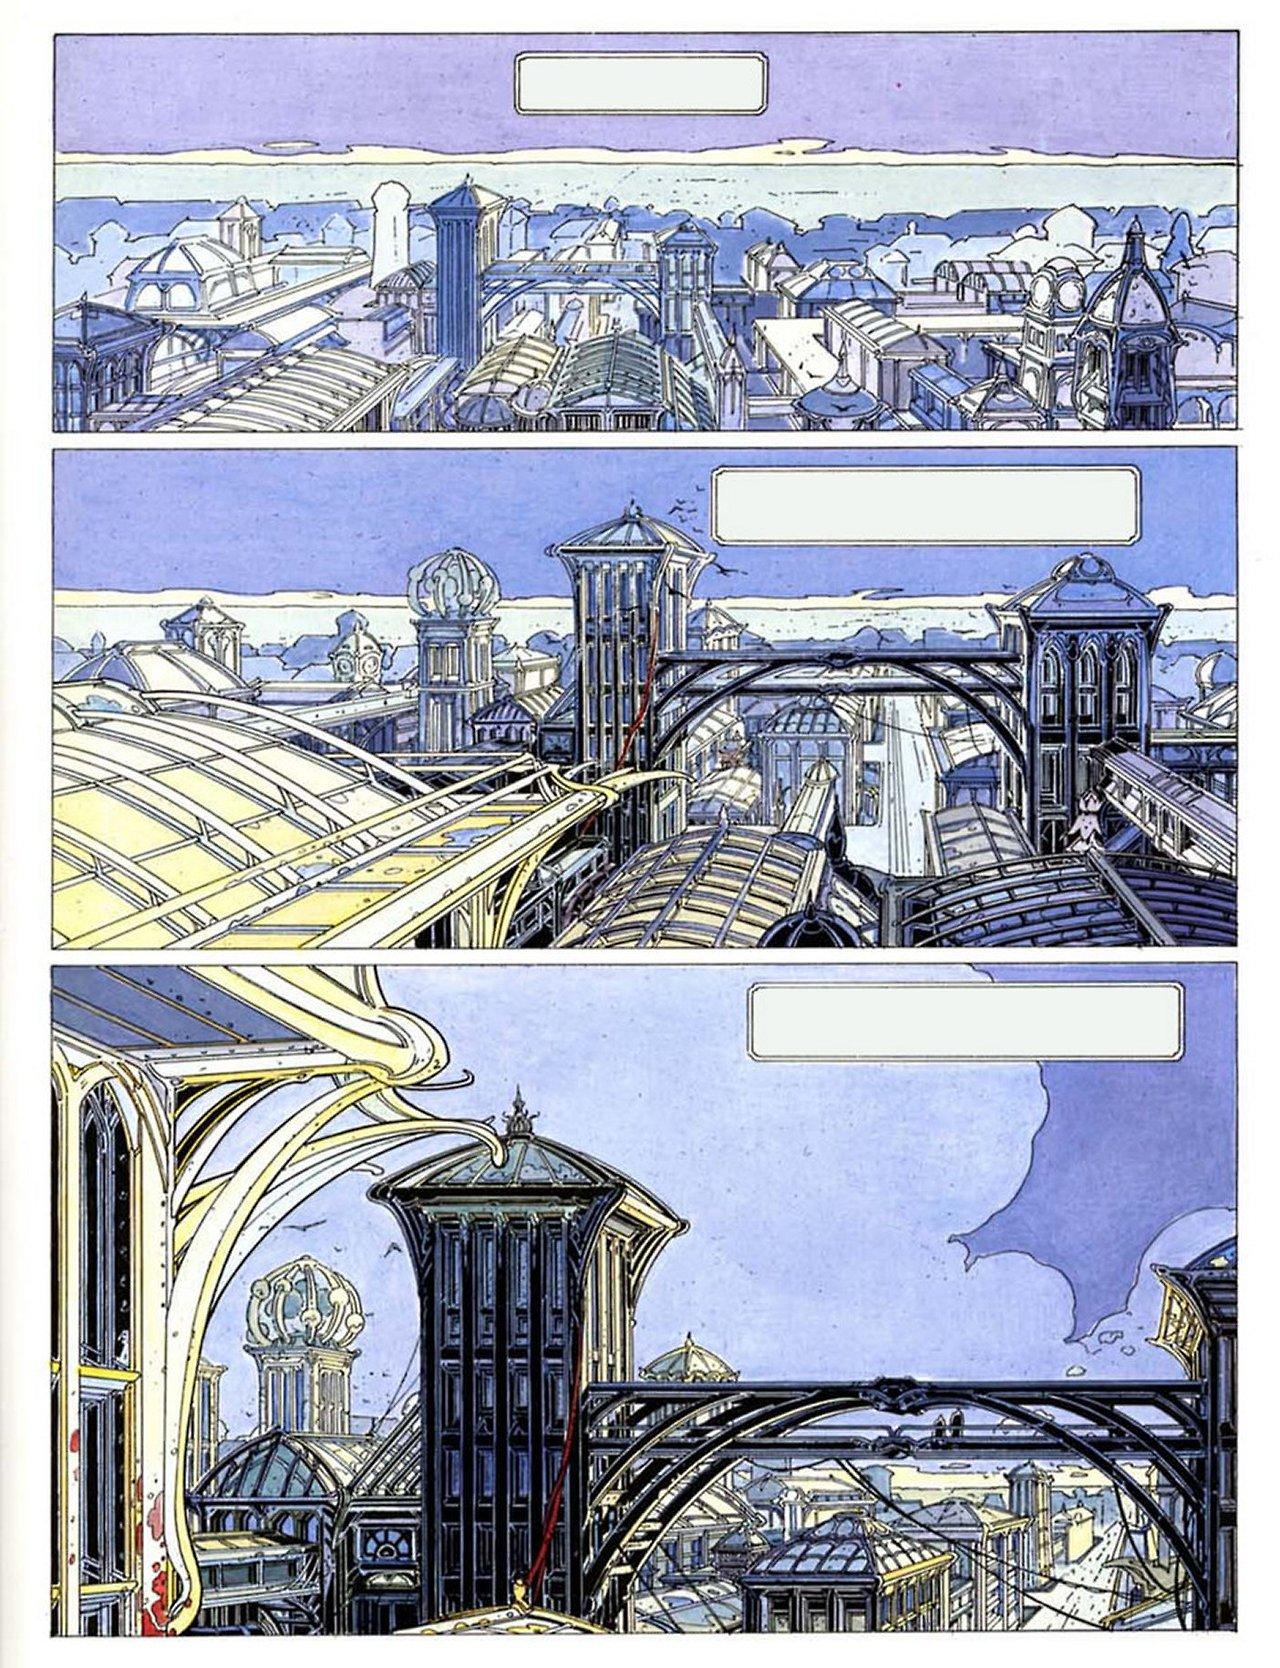 original page of Les Murailles de Samaris